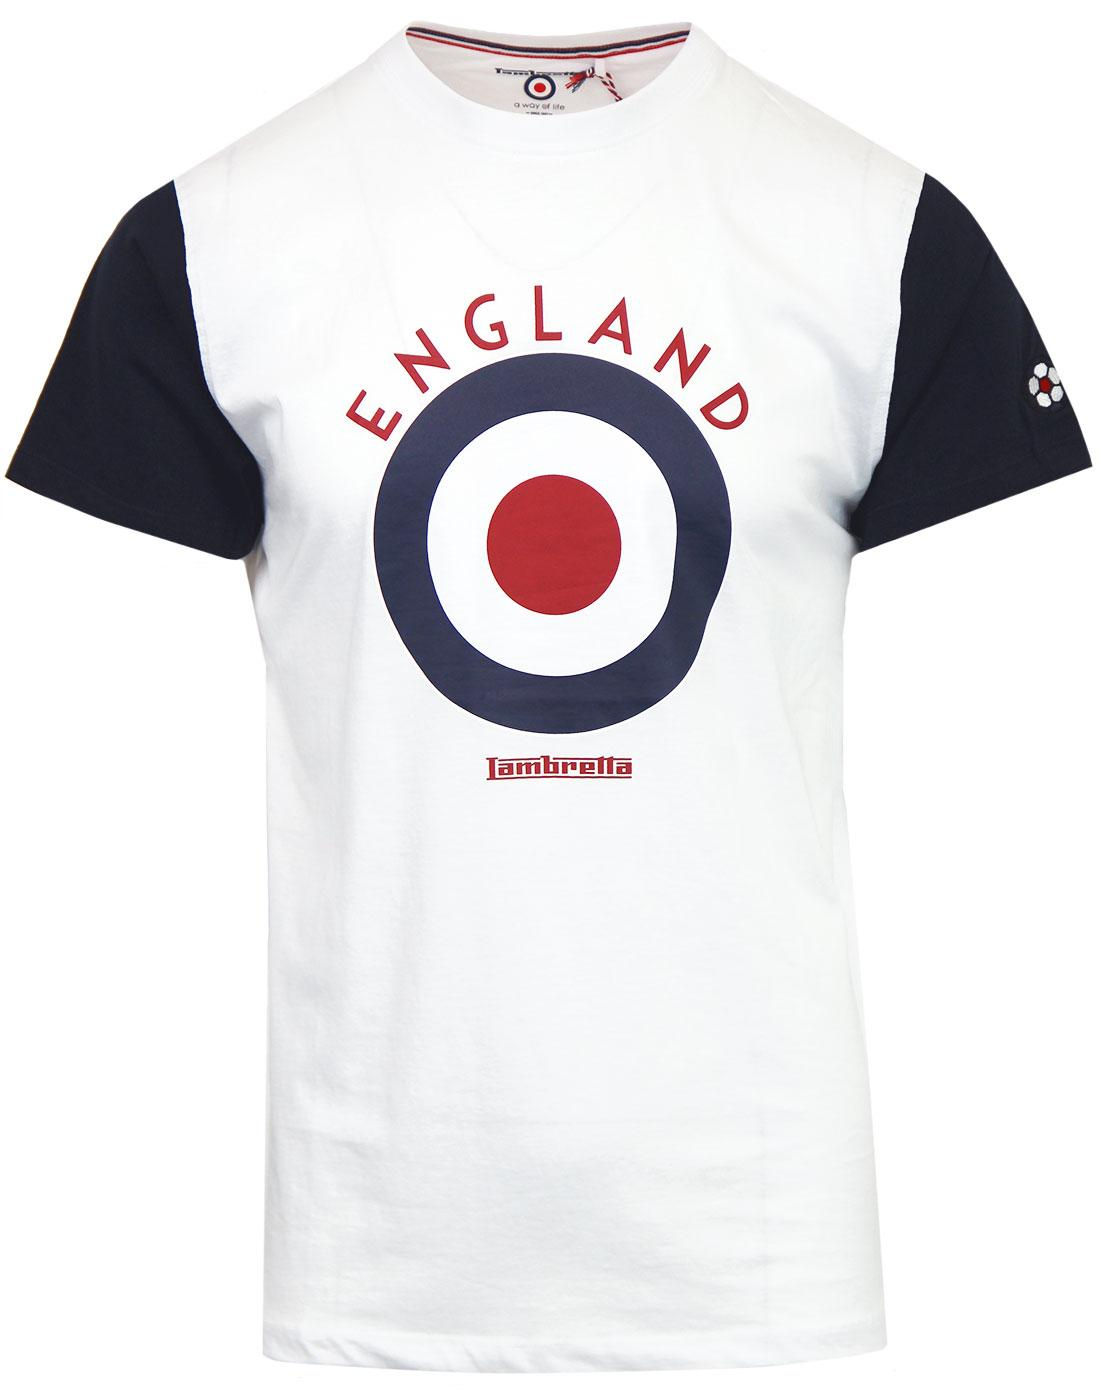 LAMBRETTA Retro Mod Target England Football Tee W